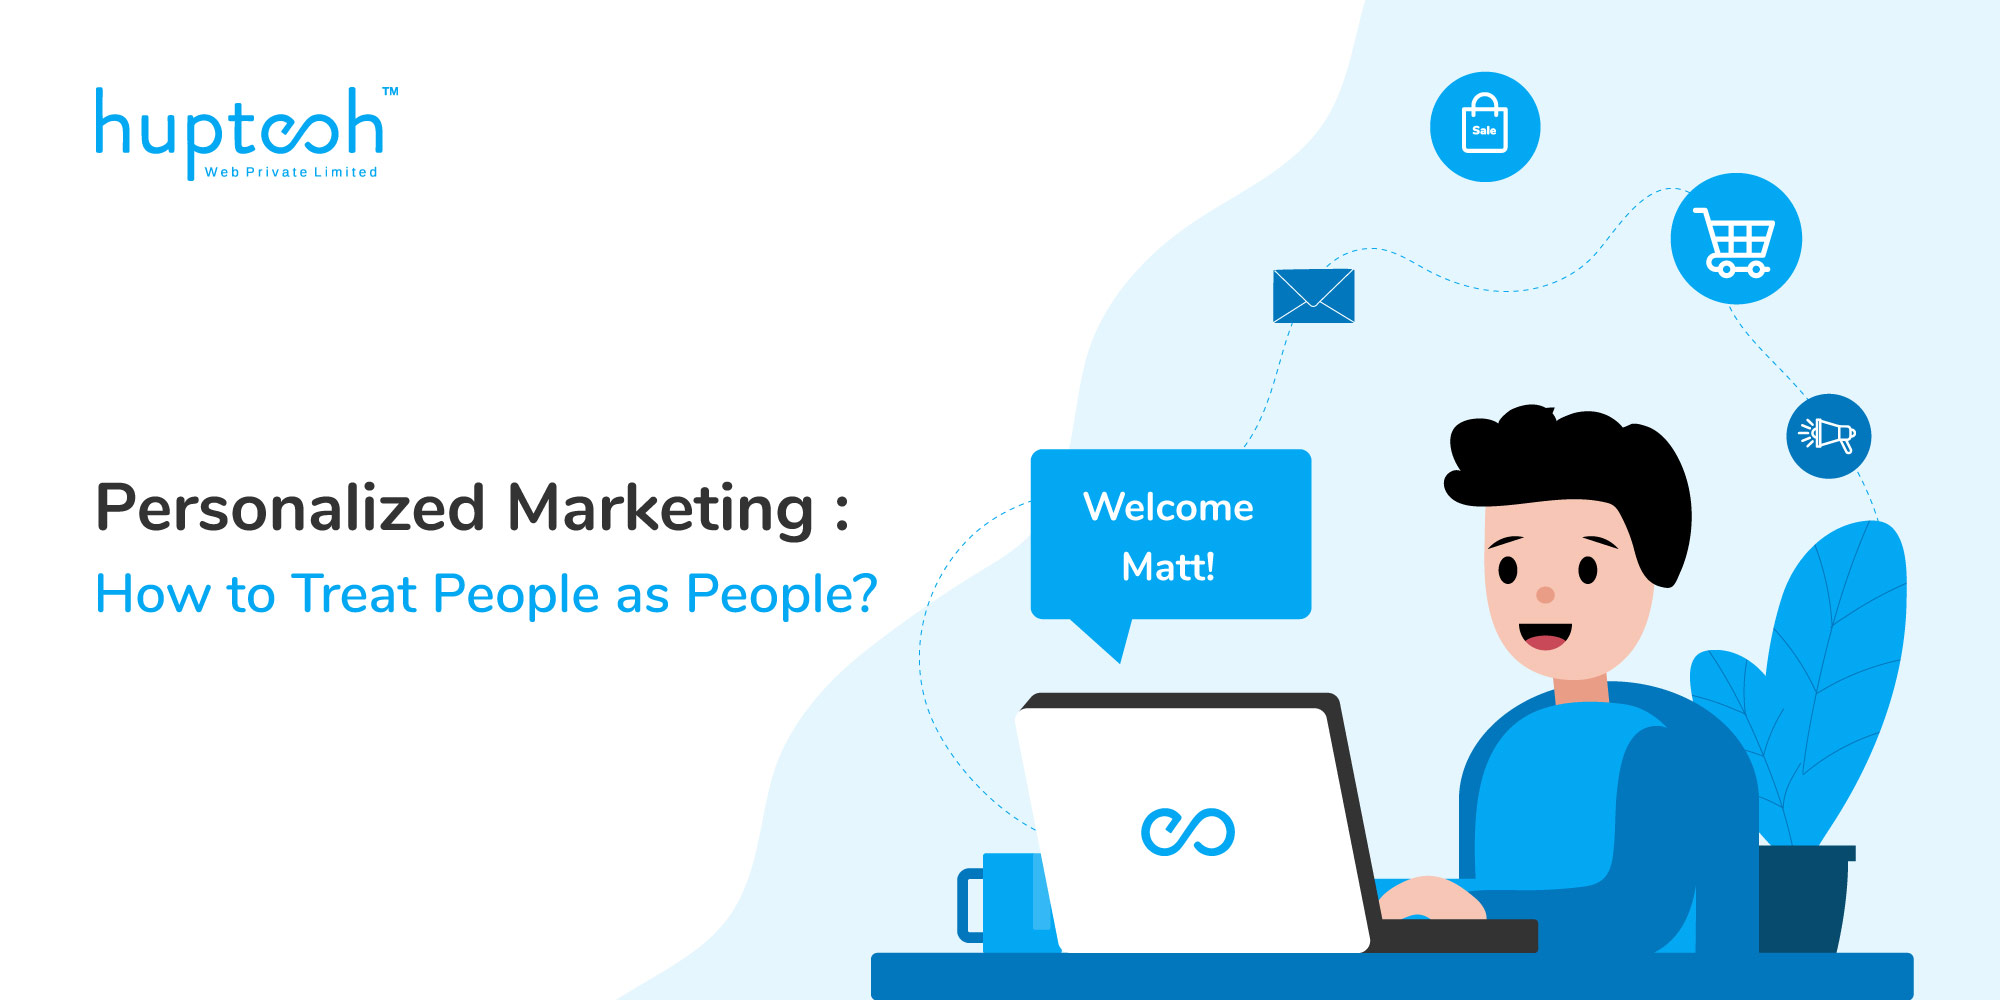 Personalized Marketing